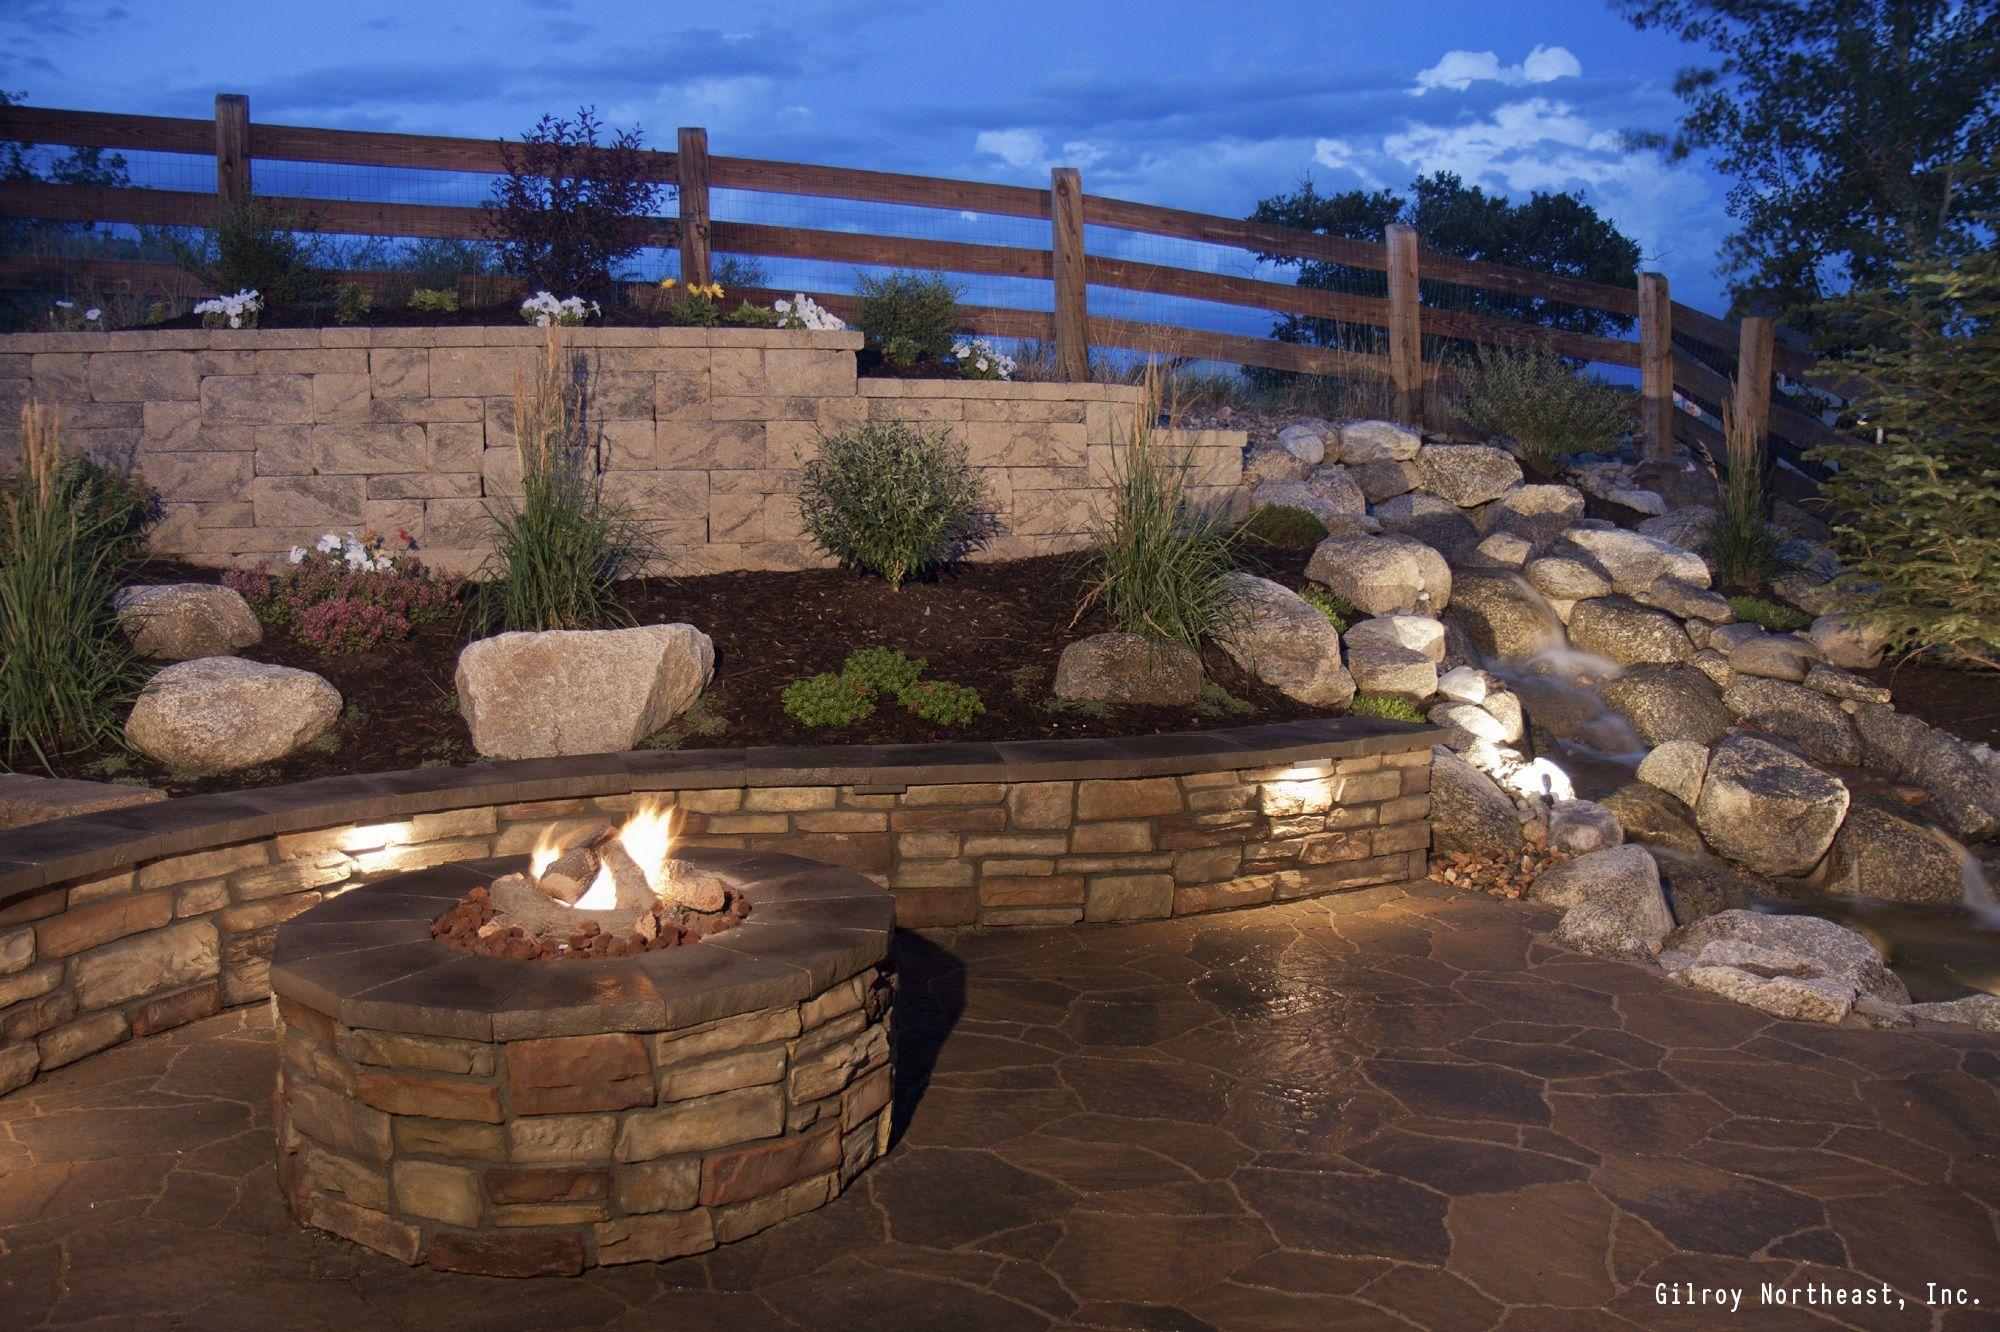 7 DIY Ways To Make Your Patio Awesome   Stone retaining ... on Patio Stone Wall Ideas id=16330